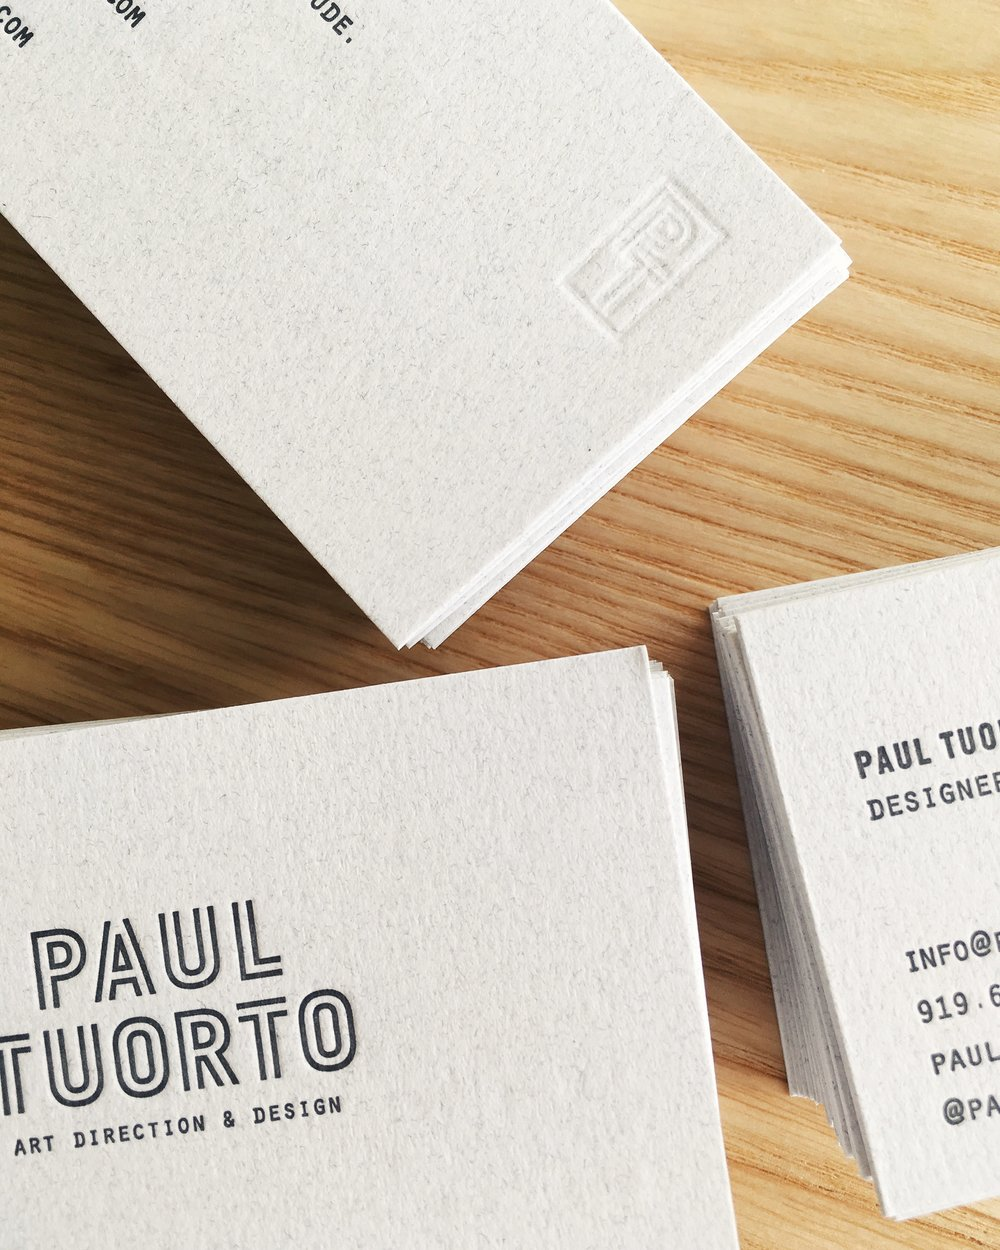 Letterpress by Good South / Paul Tuorto Letterpress Business Card